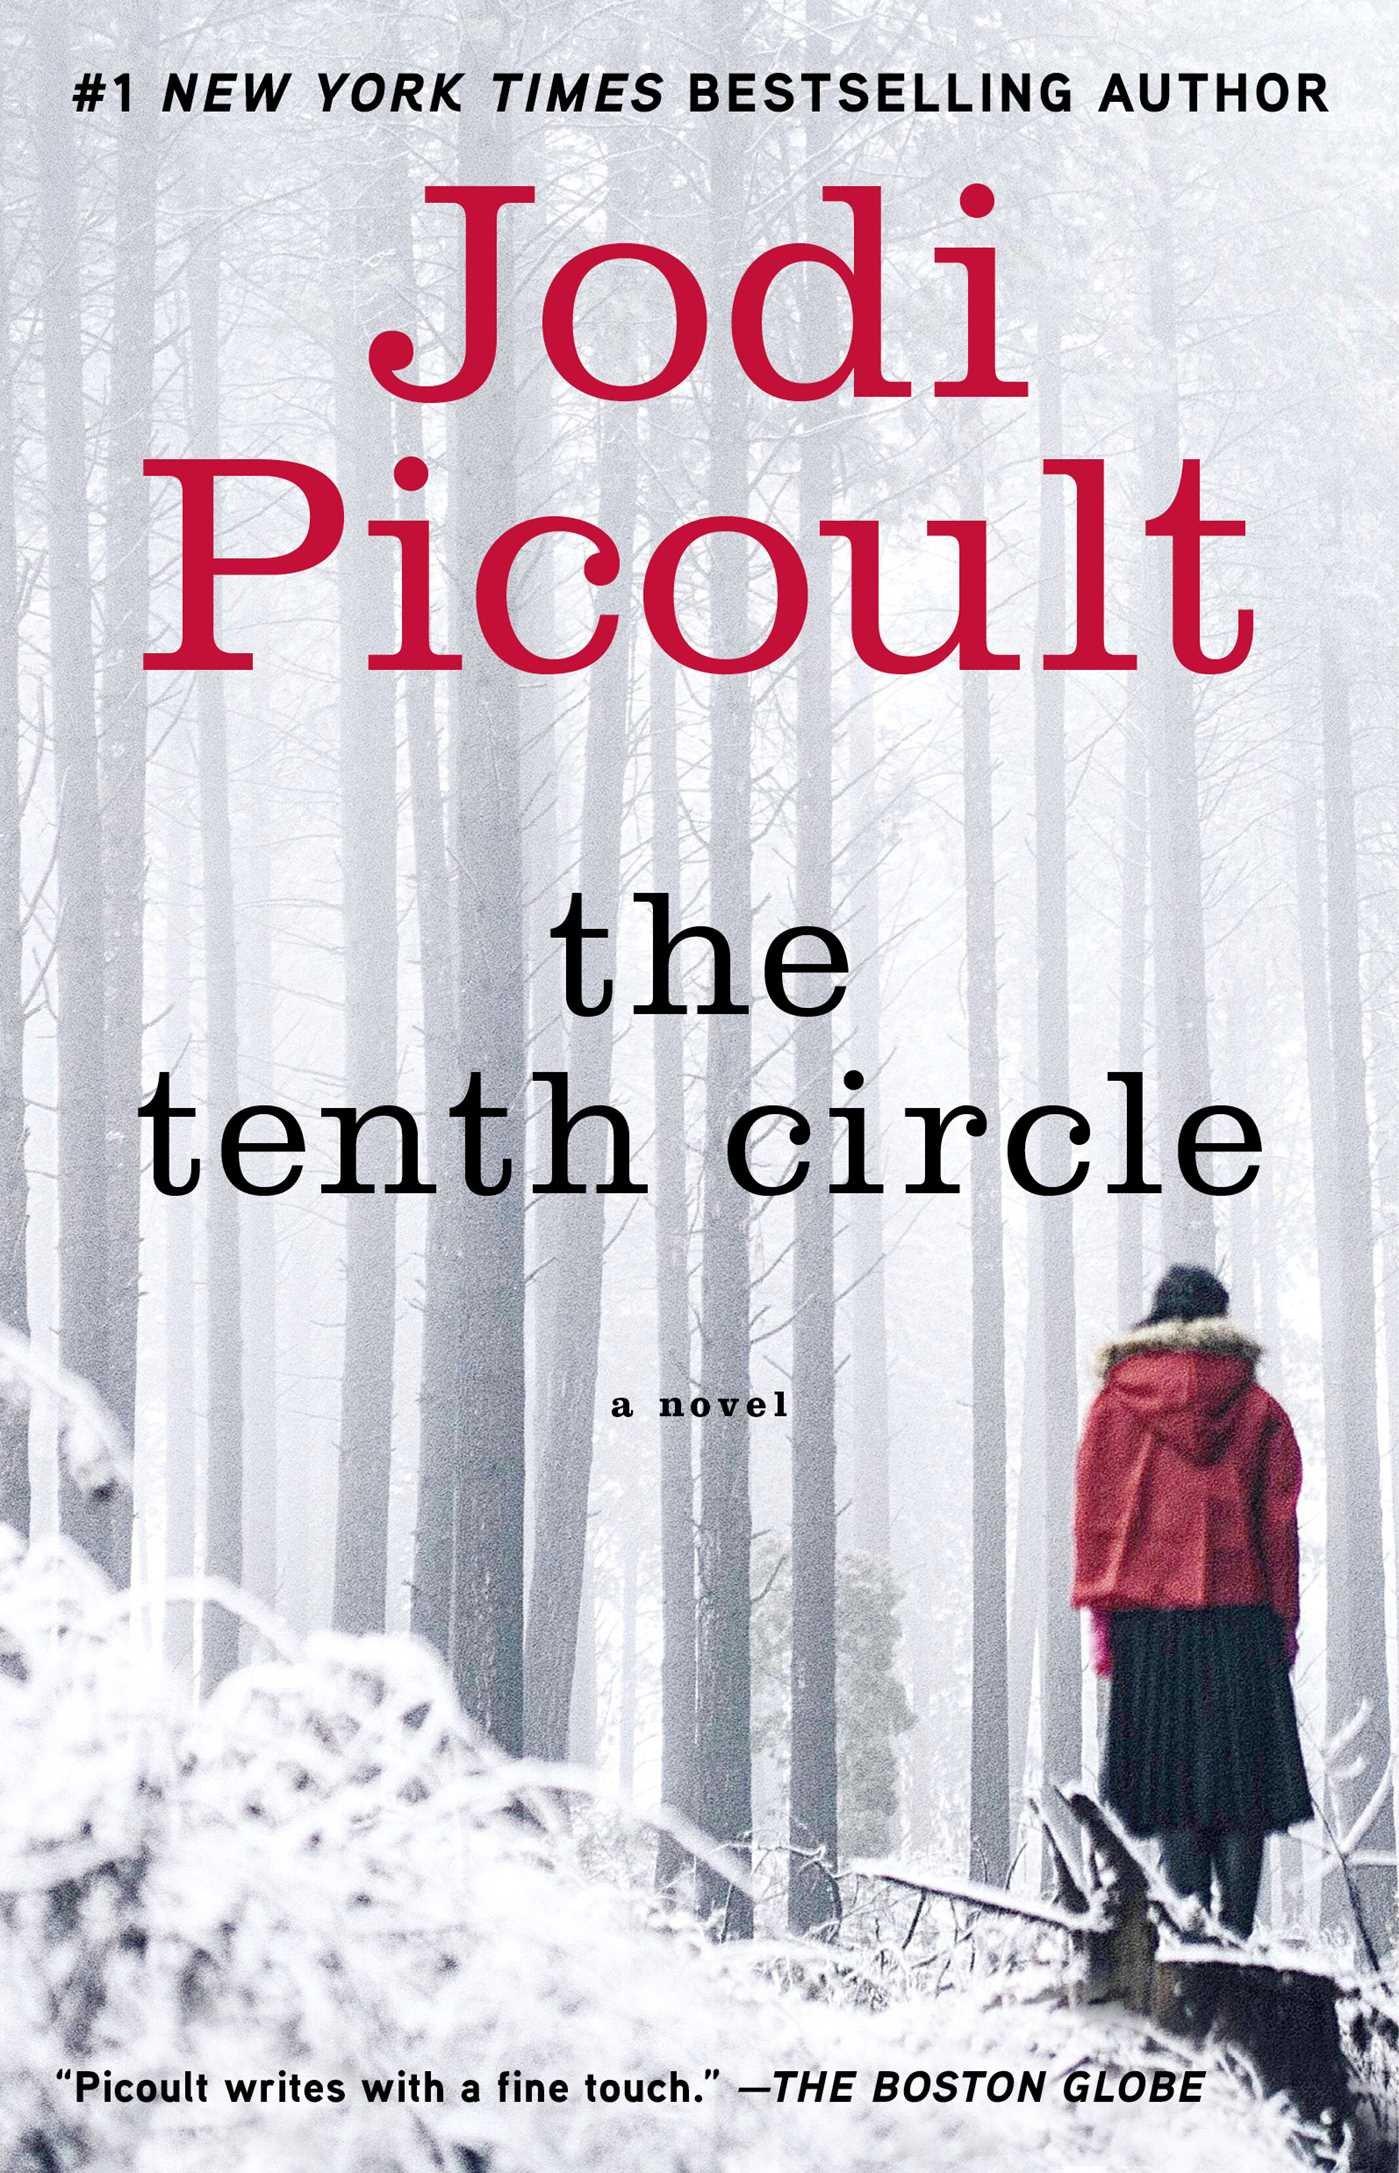 The Tenth Circle: A Novel